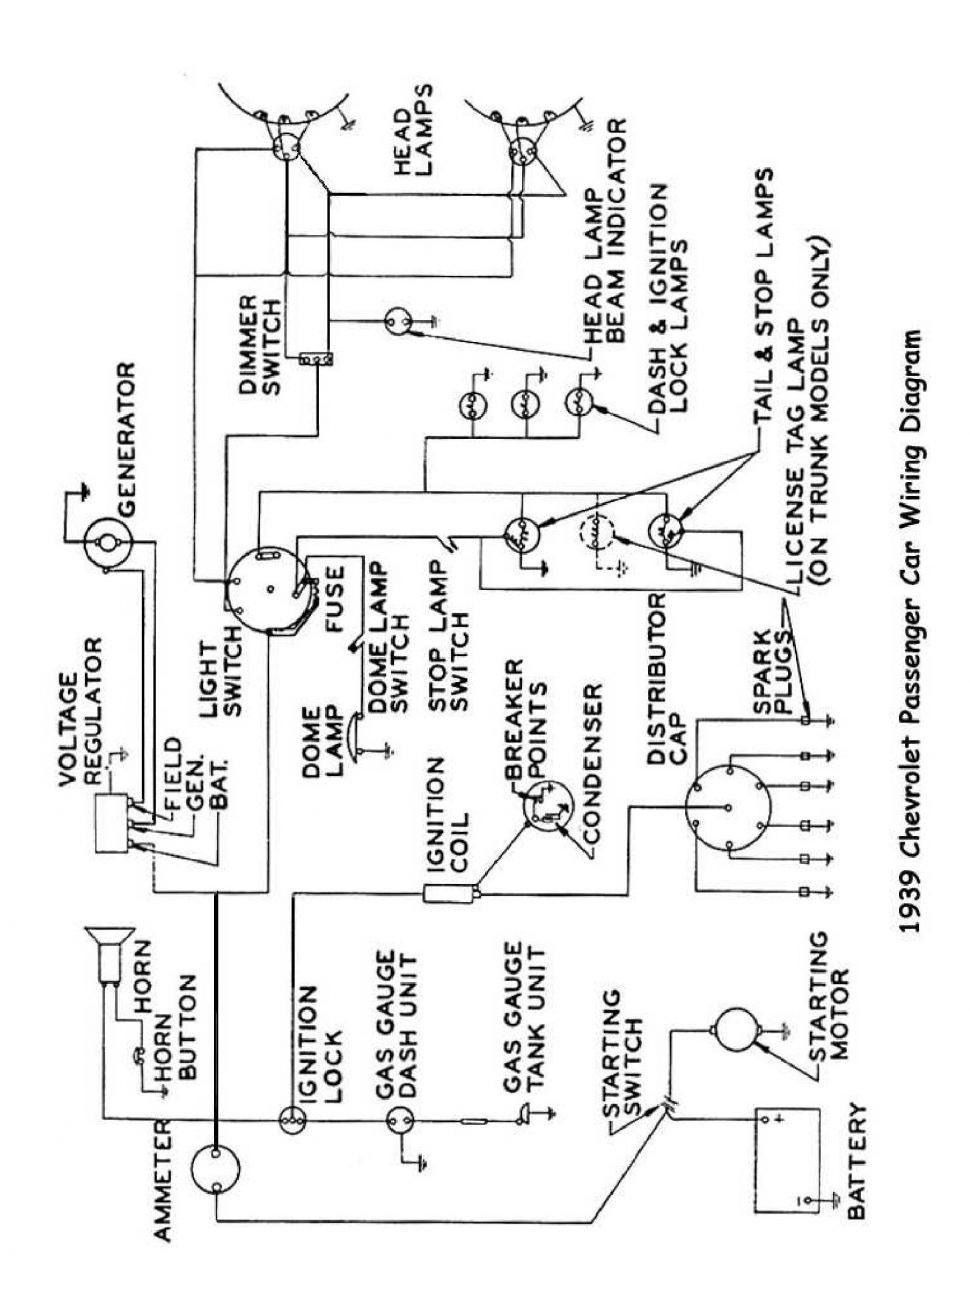 Ultra Remote Car Starter Wiring Diagram | WiringDiagram